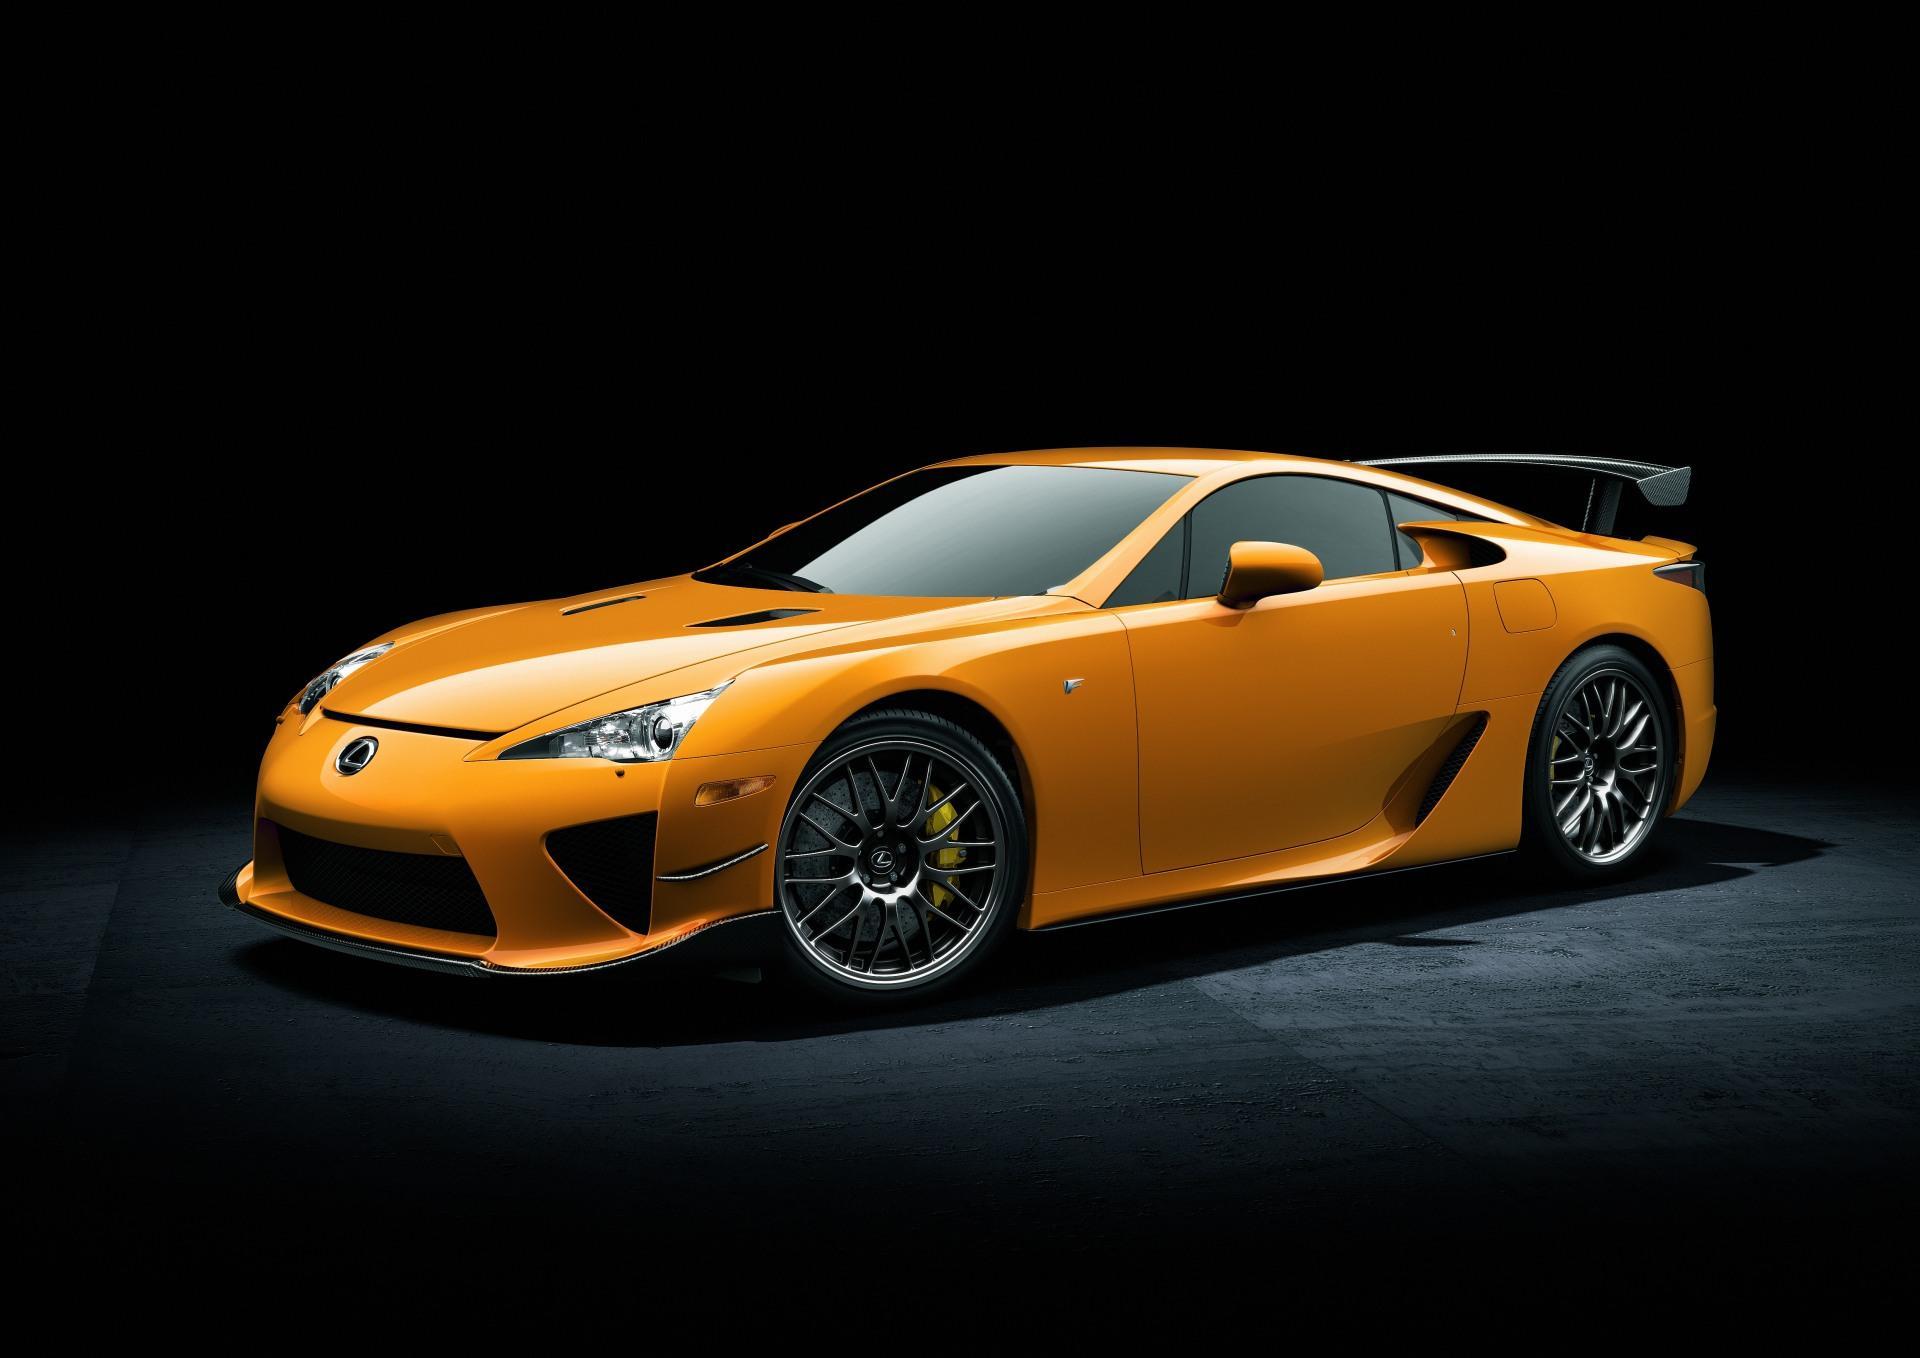 2012 lexus lfa nurburgring package - conceptcarz